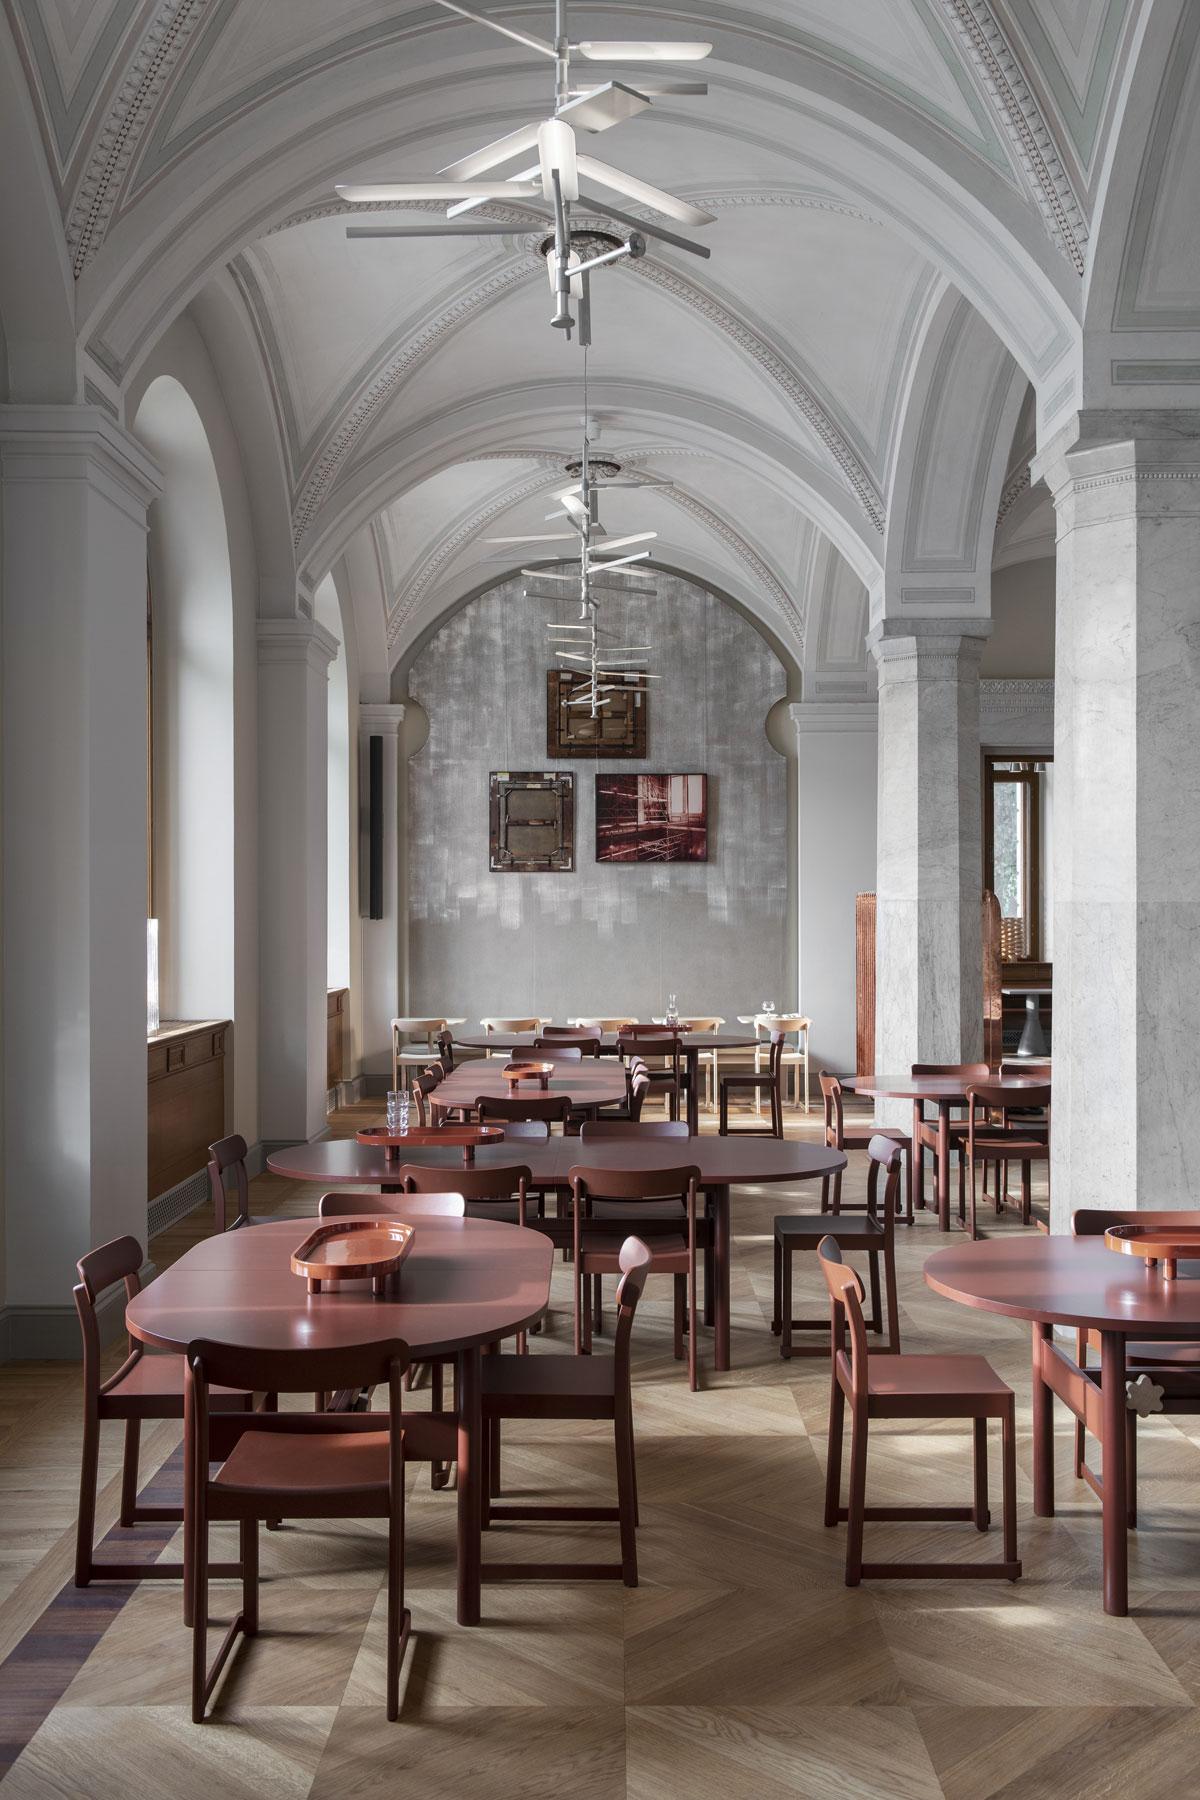 Atelier Chair, Studio Taf e Artek, ristorante